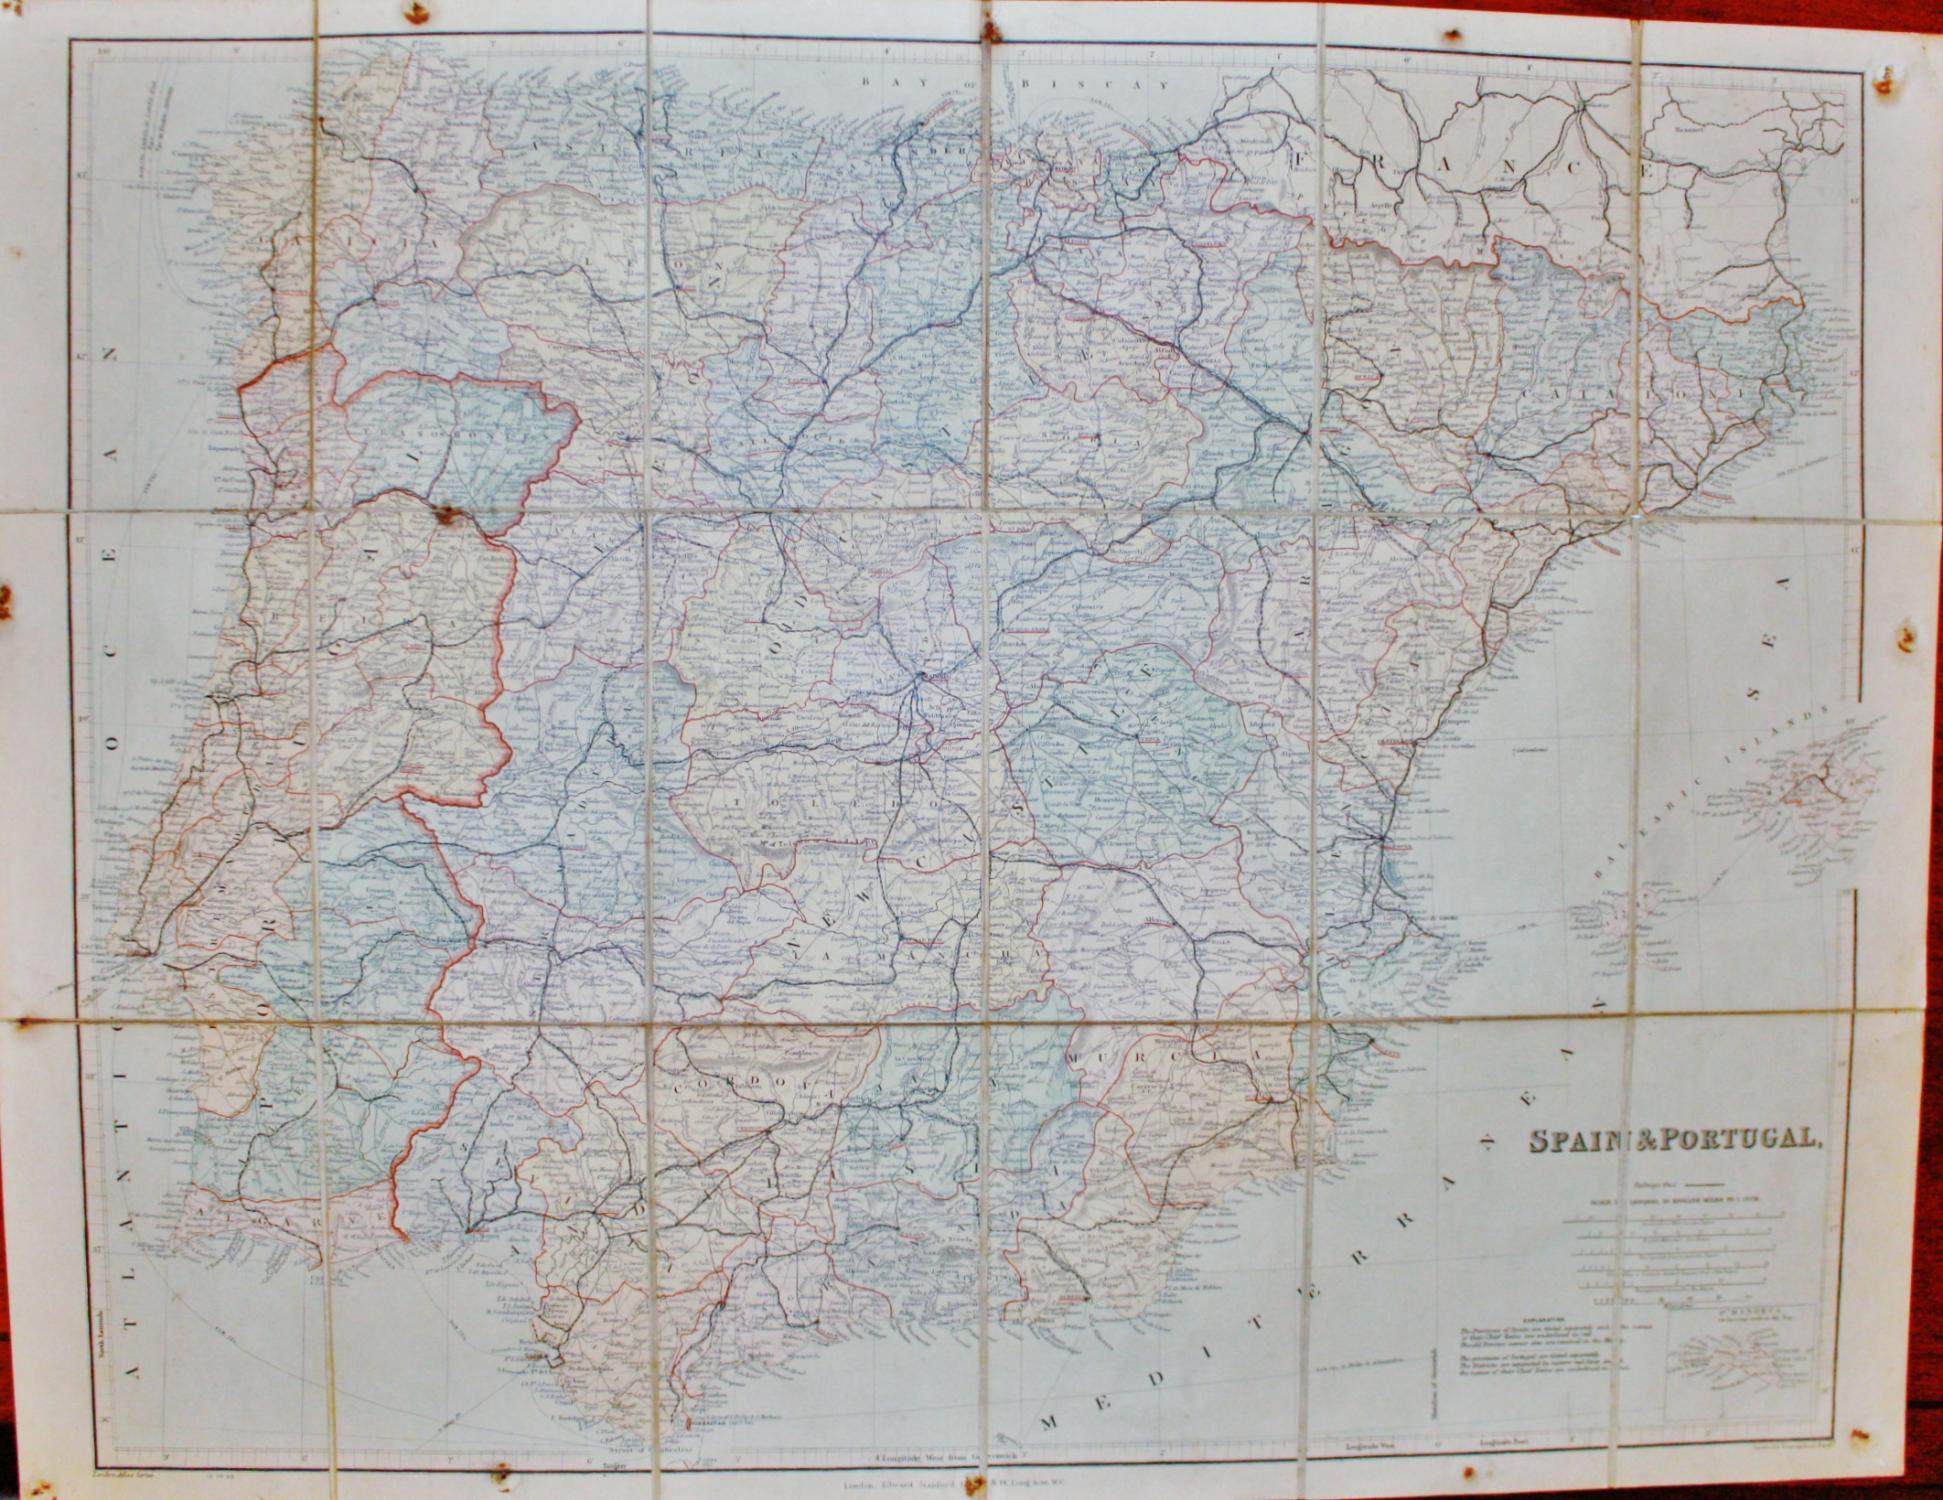 London Atlas Map.London Atlas Map Of Spain And Portugal